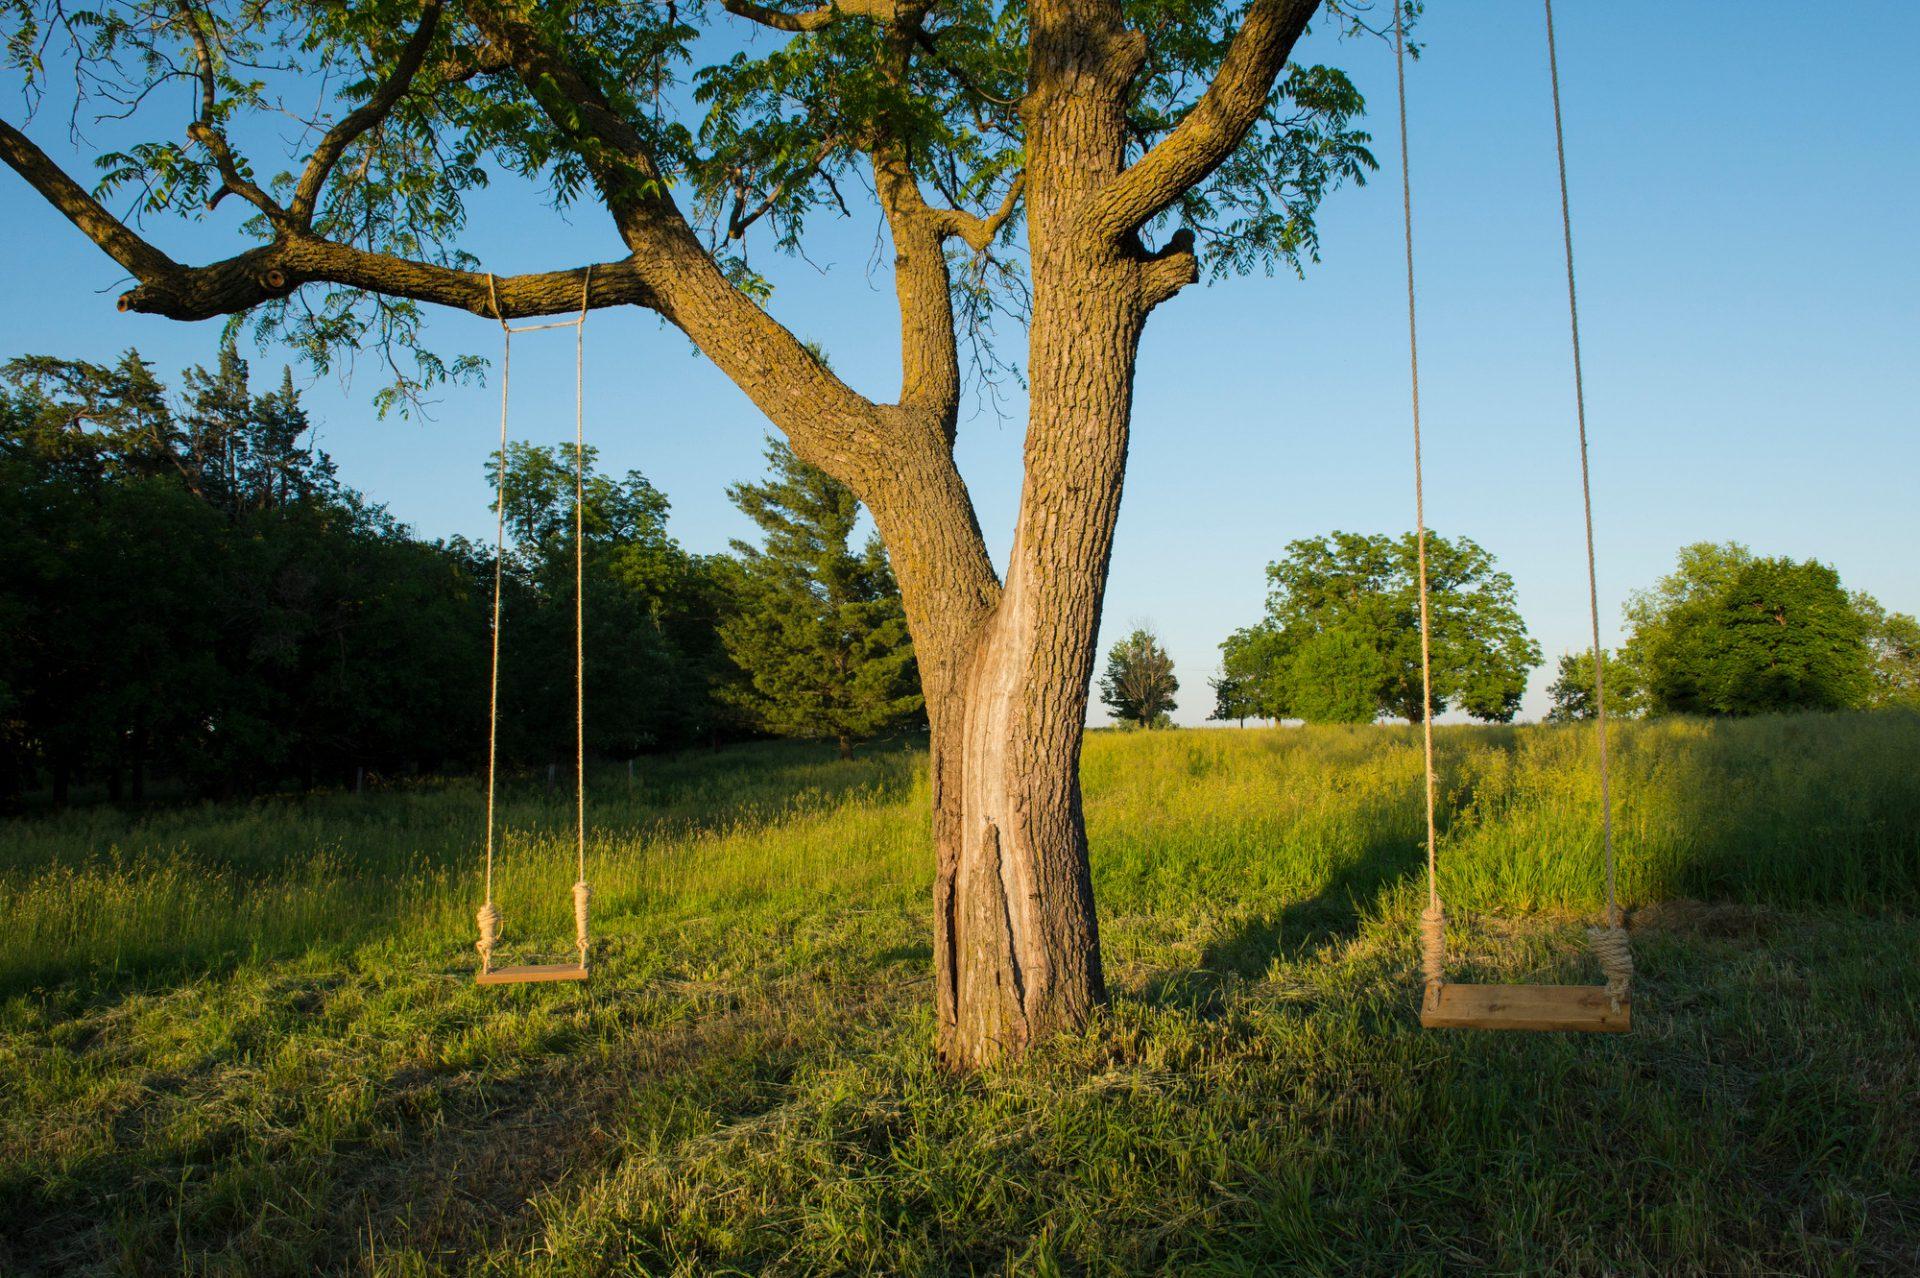 Photo: Tree swings sway in the wind.